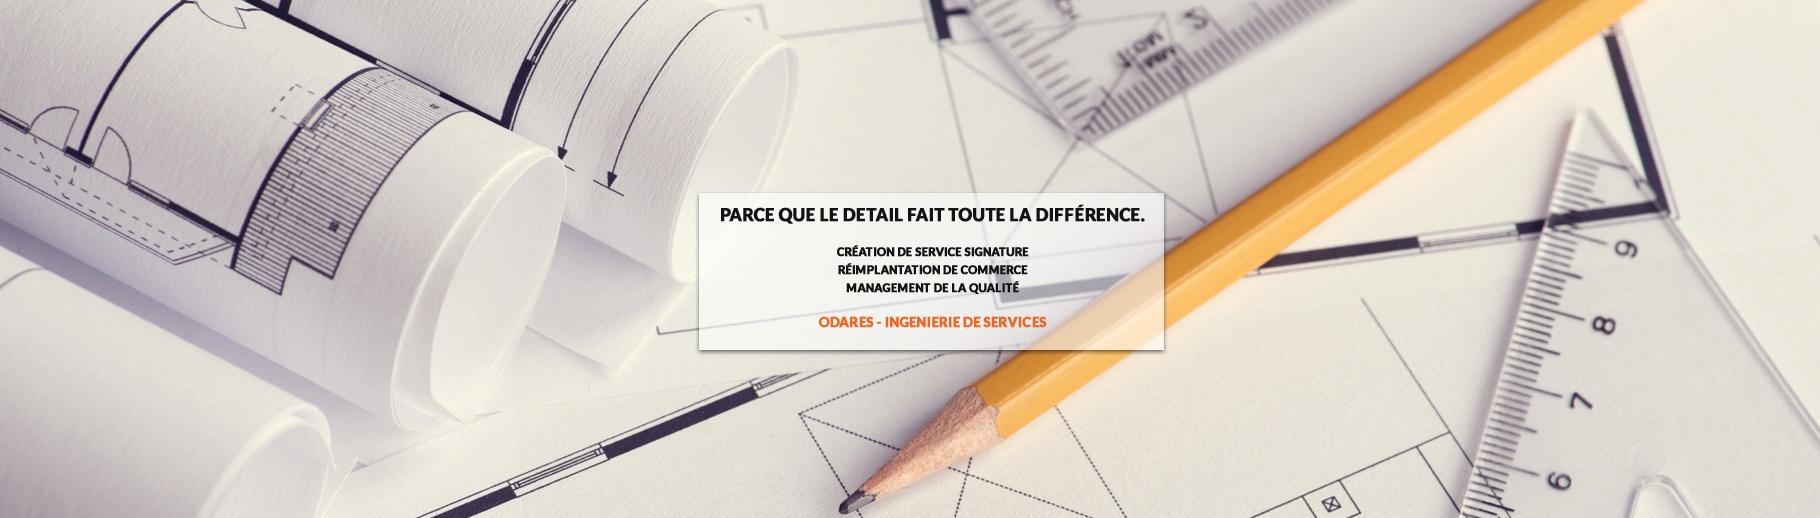 Odares - Ingénierie de services